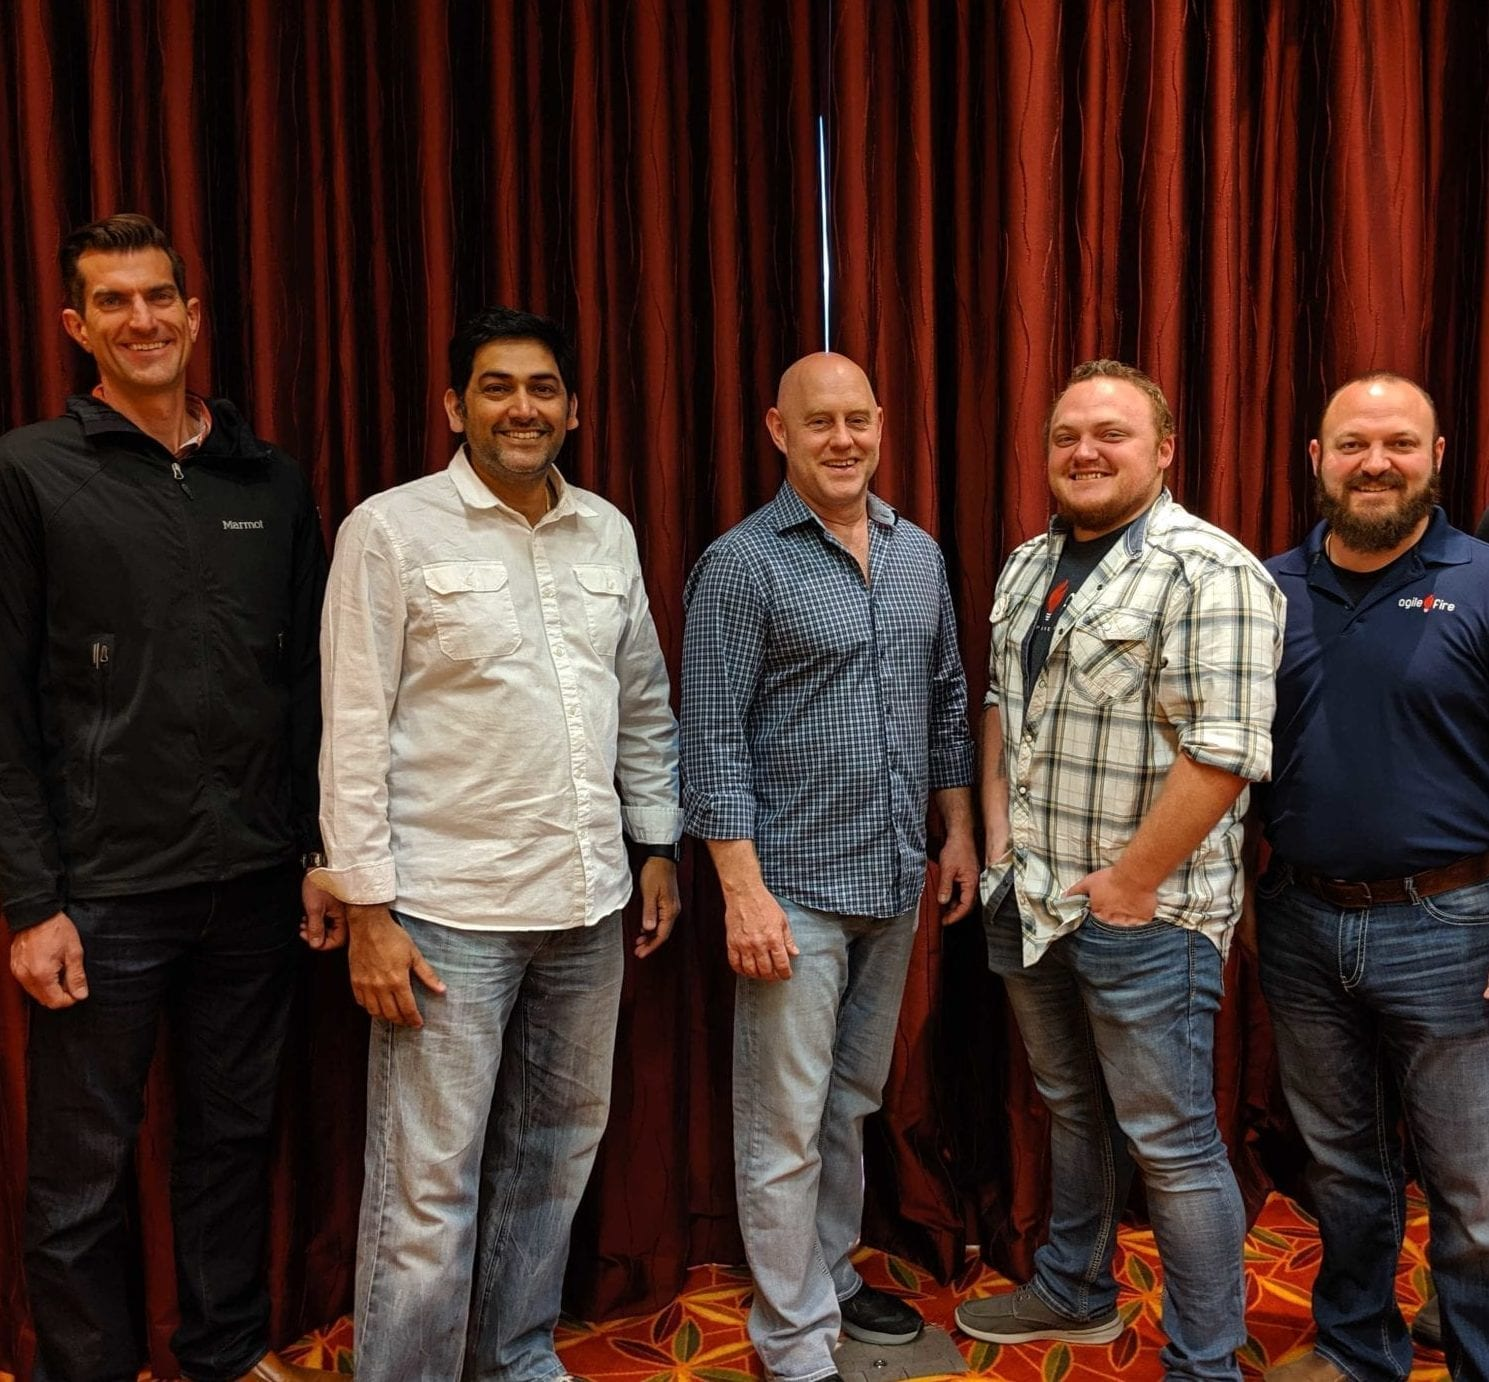 AgileFire team of coaches Bob Ternes, Ramesh Nori, Ian Merwin, Tristan Aragon, Joshua Aragon